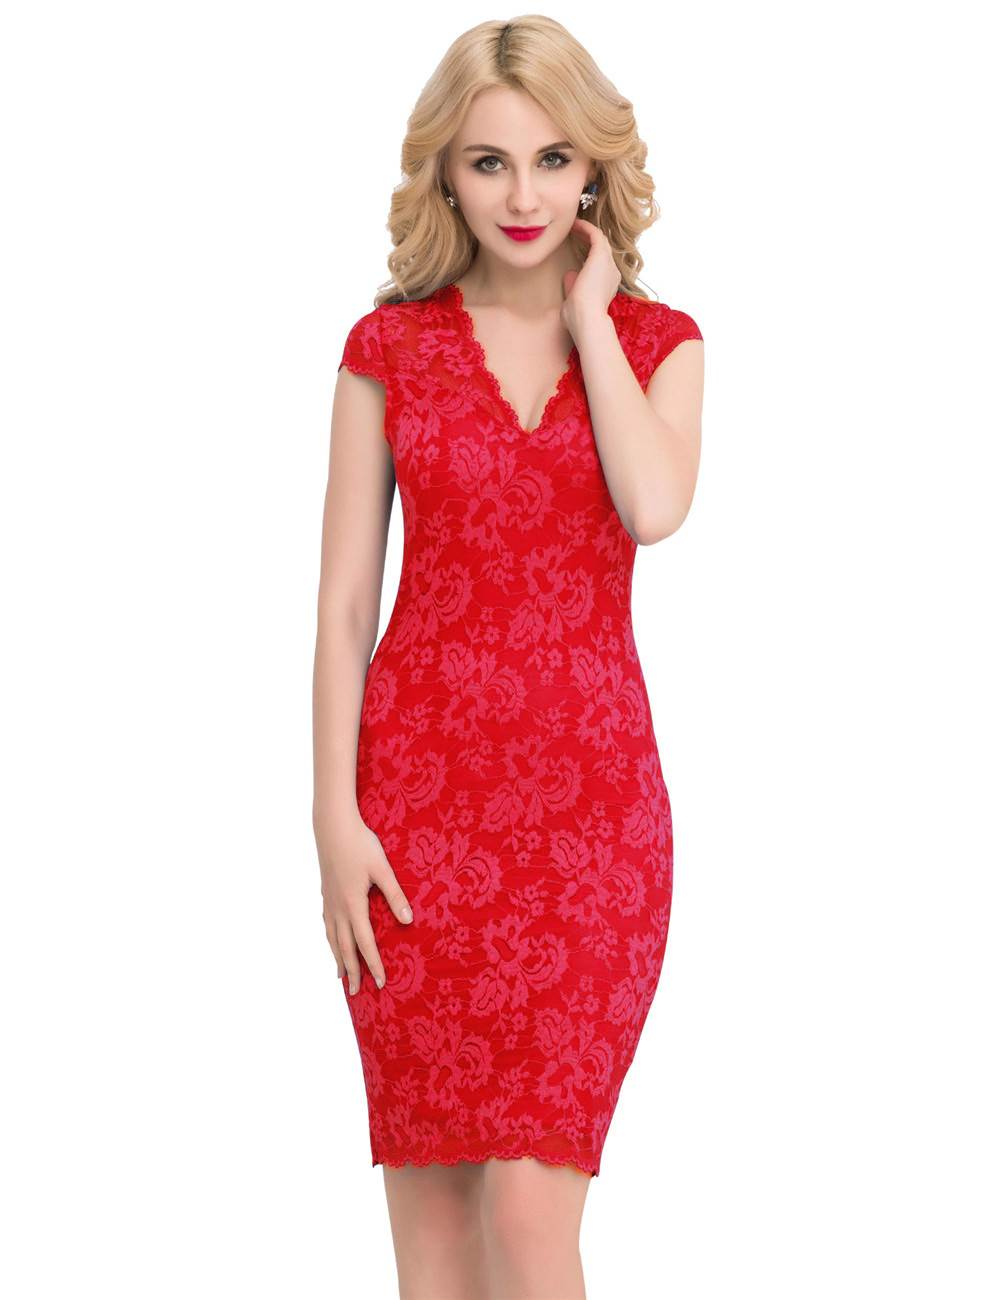 Ohyeah Slim Elegant Lace Half Sleeve Fashion Dress